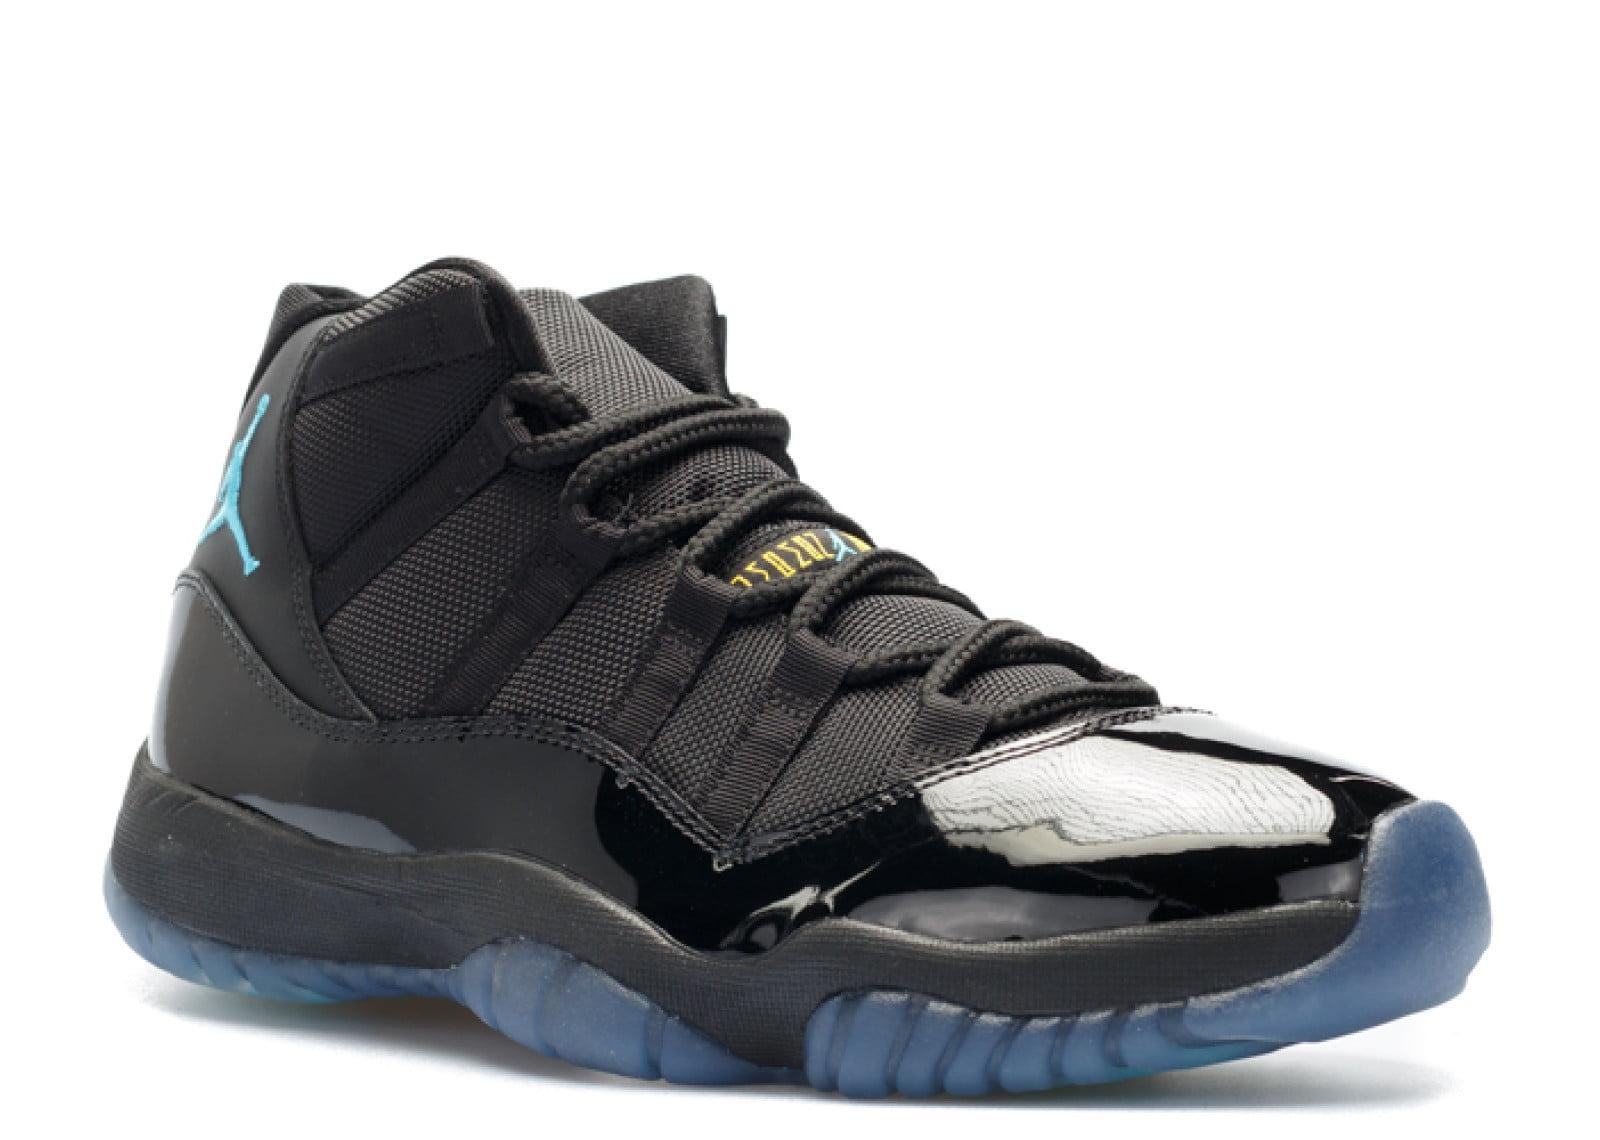 acd886ec4ef7d Air Jordan - Men - Air Jordan 11 Retro  Gamma Blue  - 378037-006 - Size 15